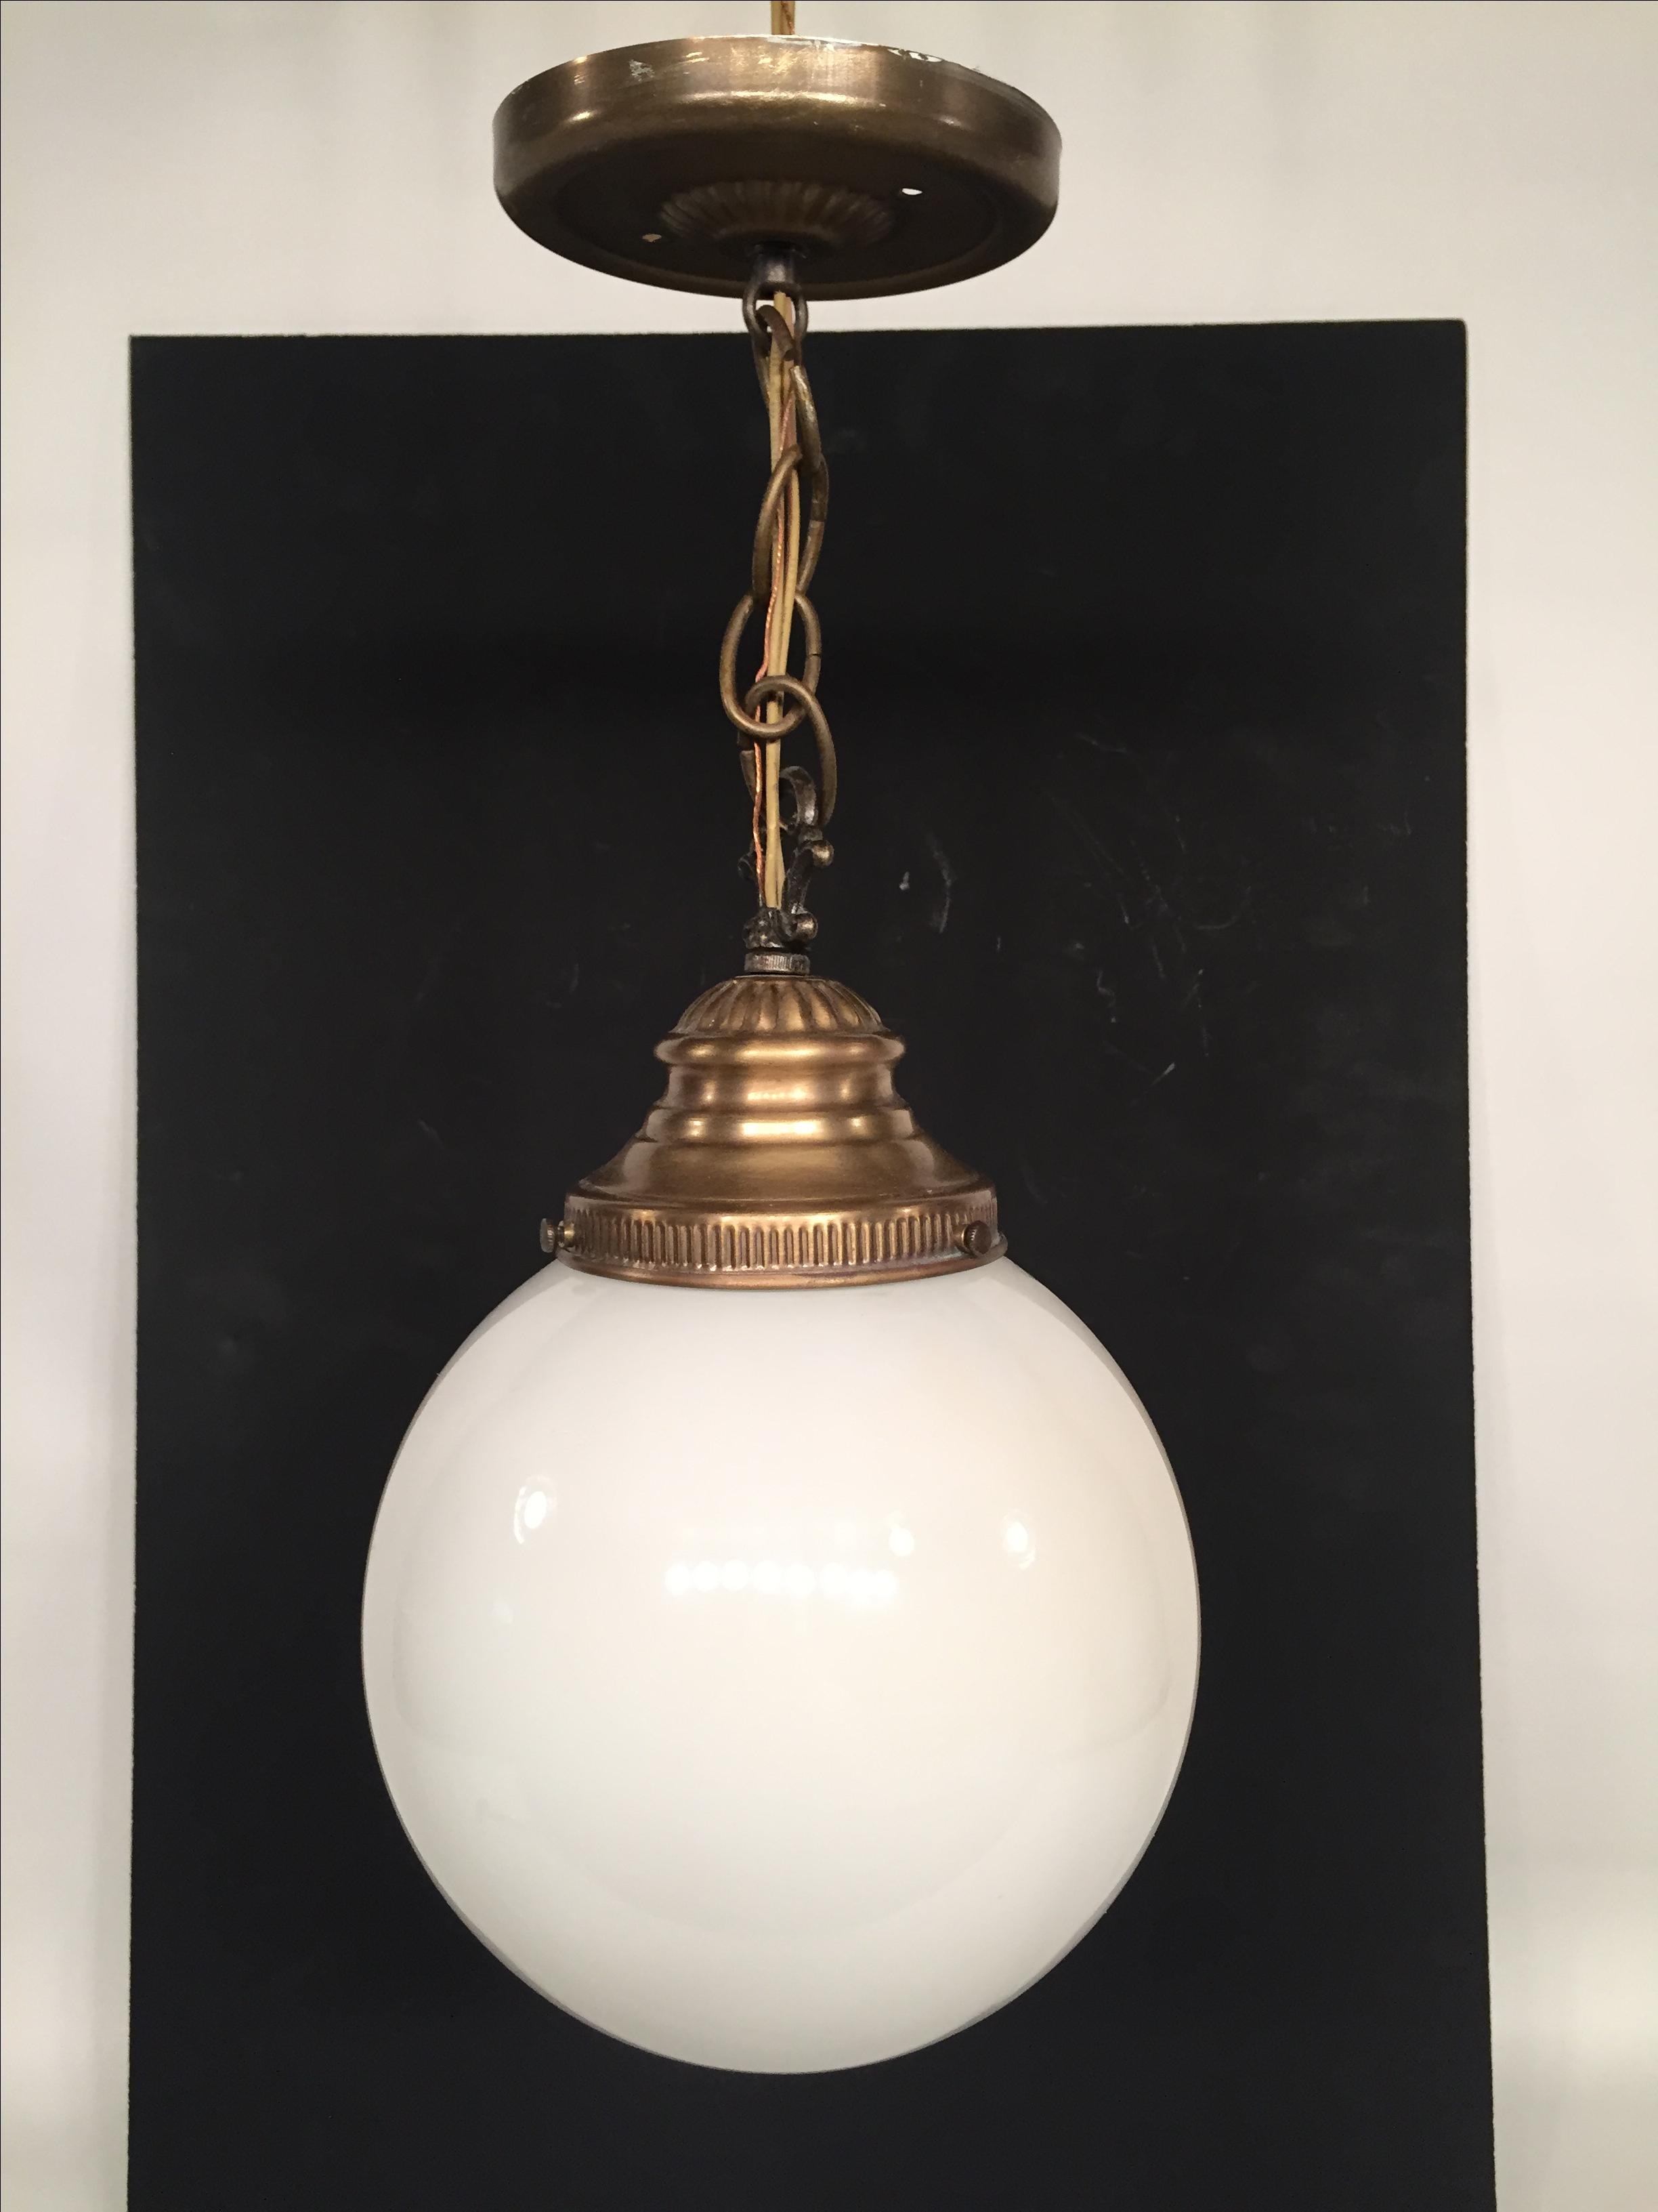 Brass Pendant Globe L& - Image 2 ...  sc 1 st  Chairish & Vintage Lavery u0026 Co. Brass Pendant Globe Lamp | Chairish azcodes.com